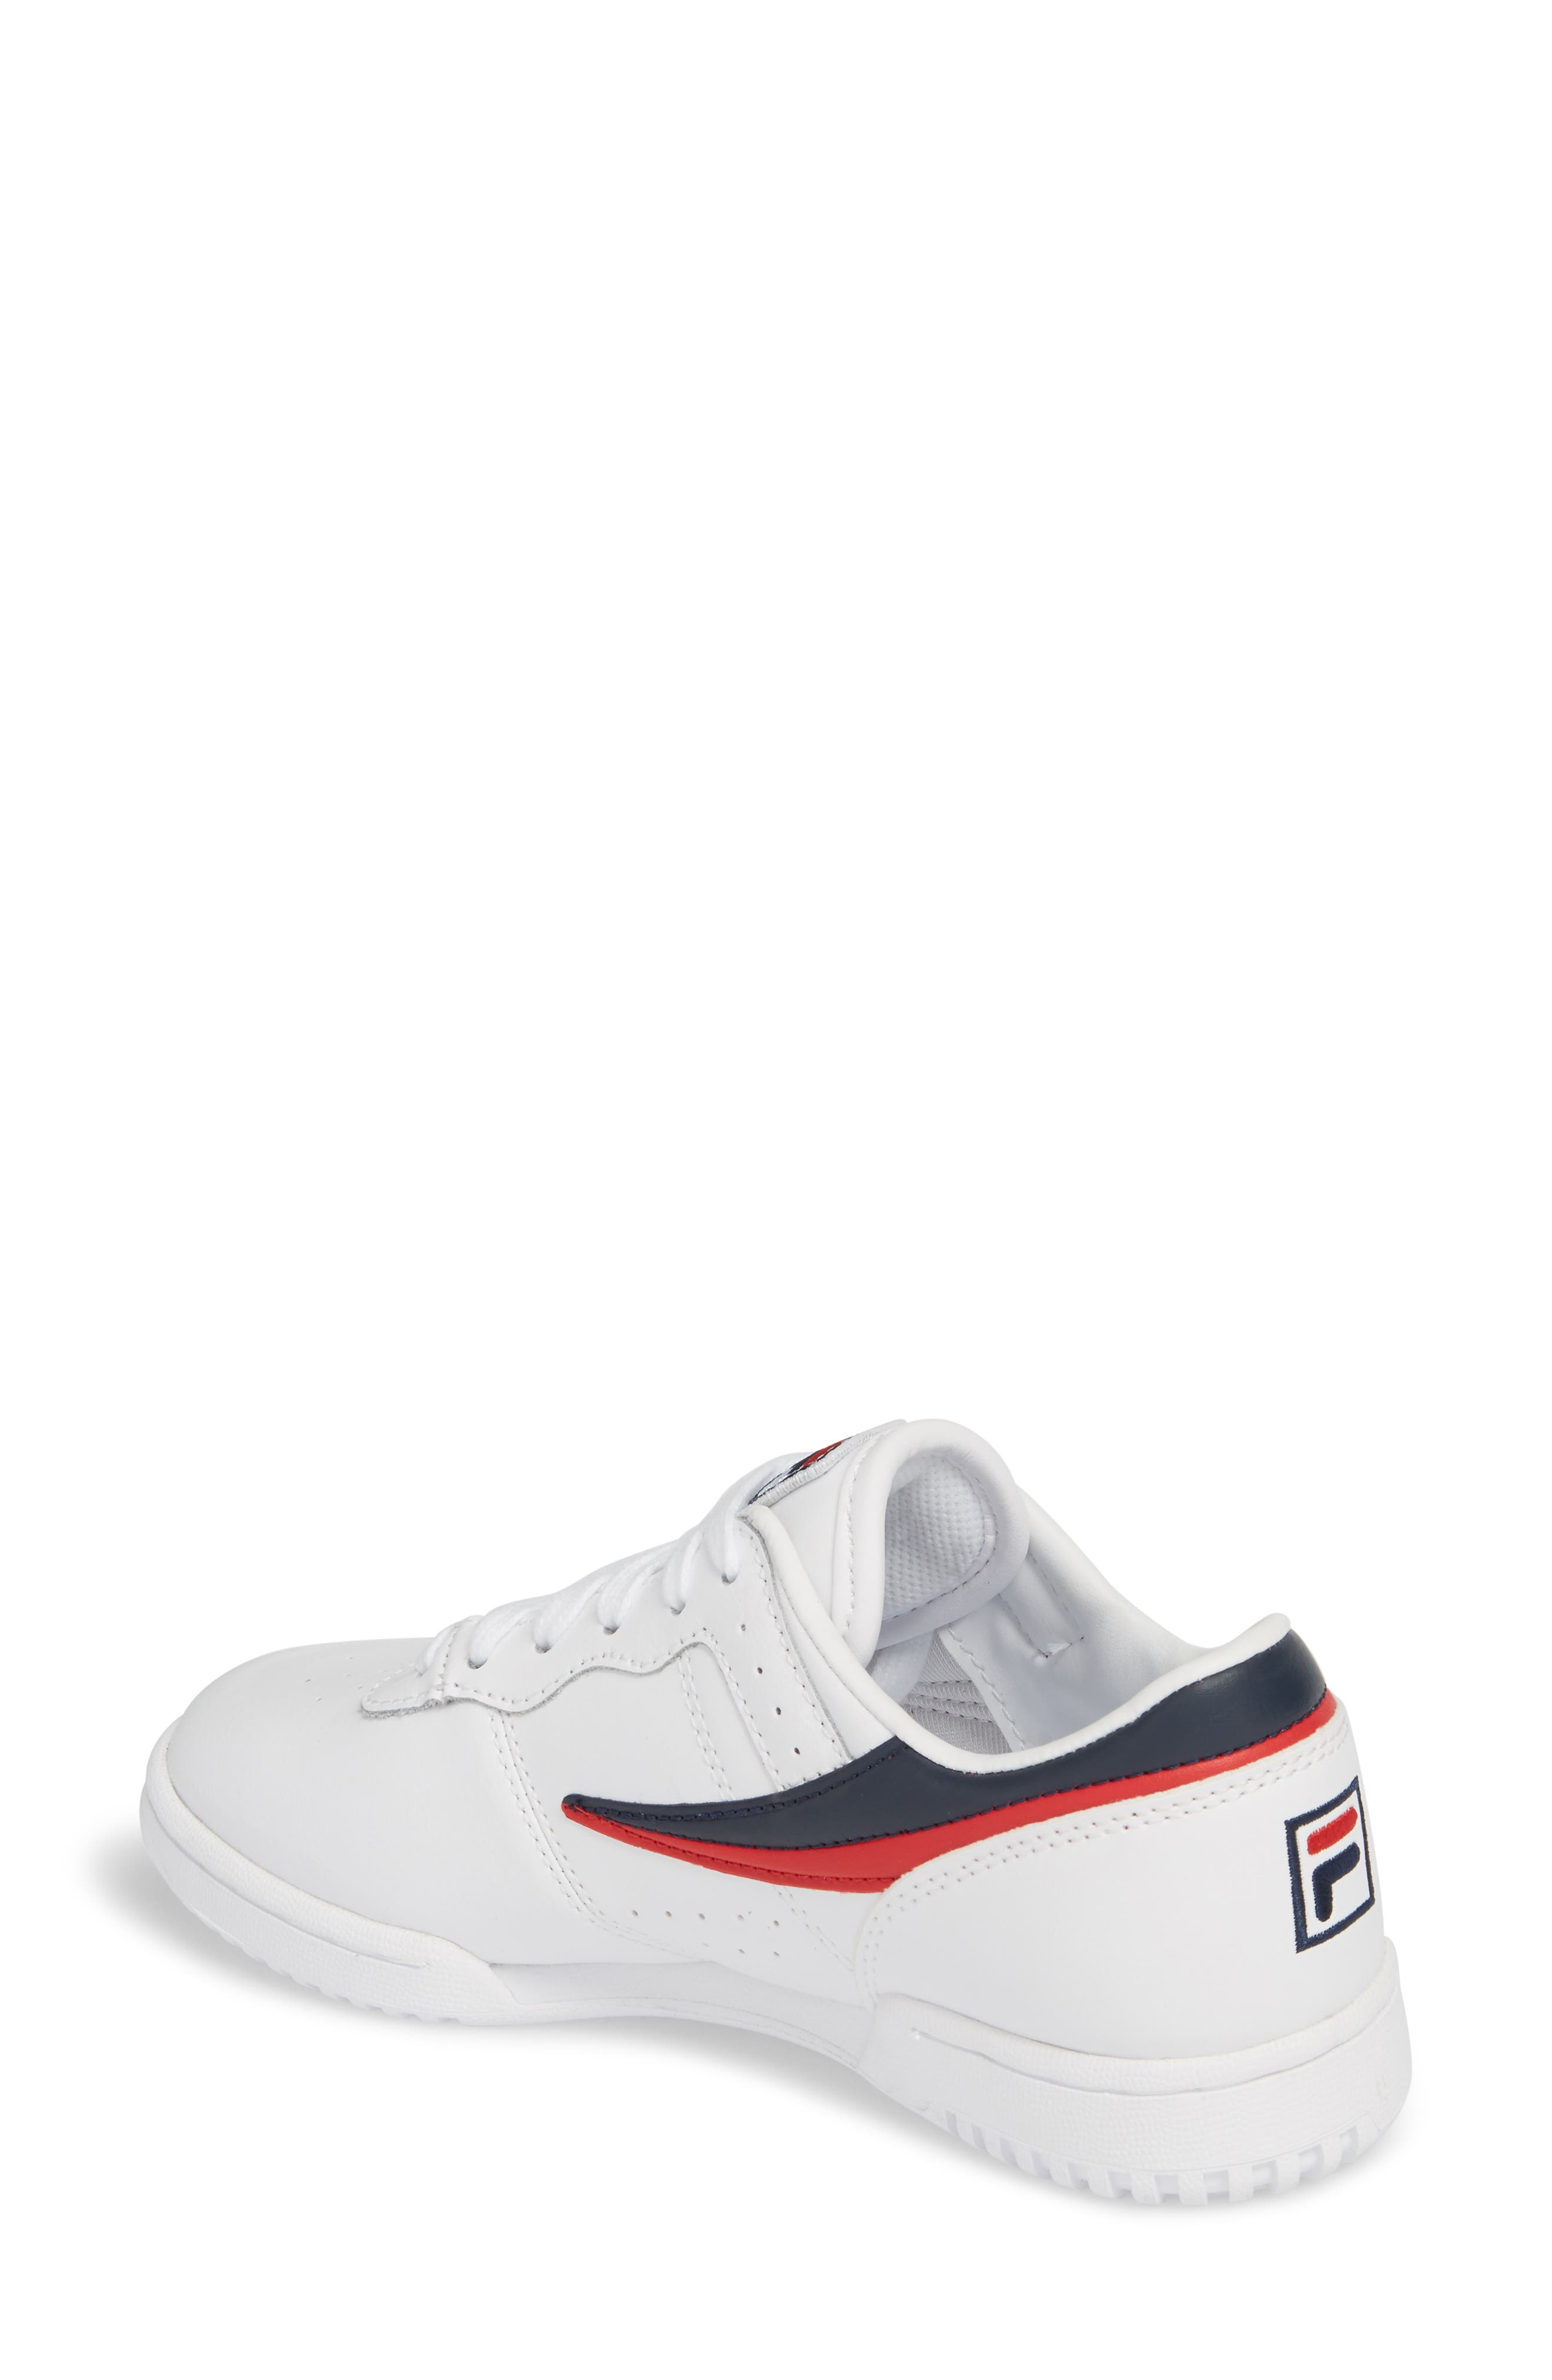 Original Fitness Sneaker,                             Alternate thumbnail 4, color,